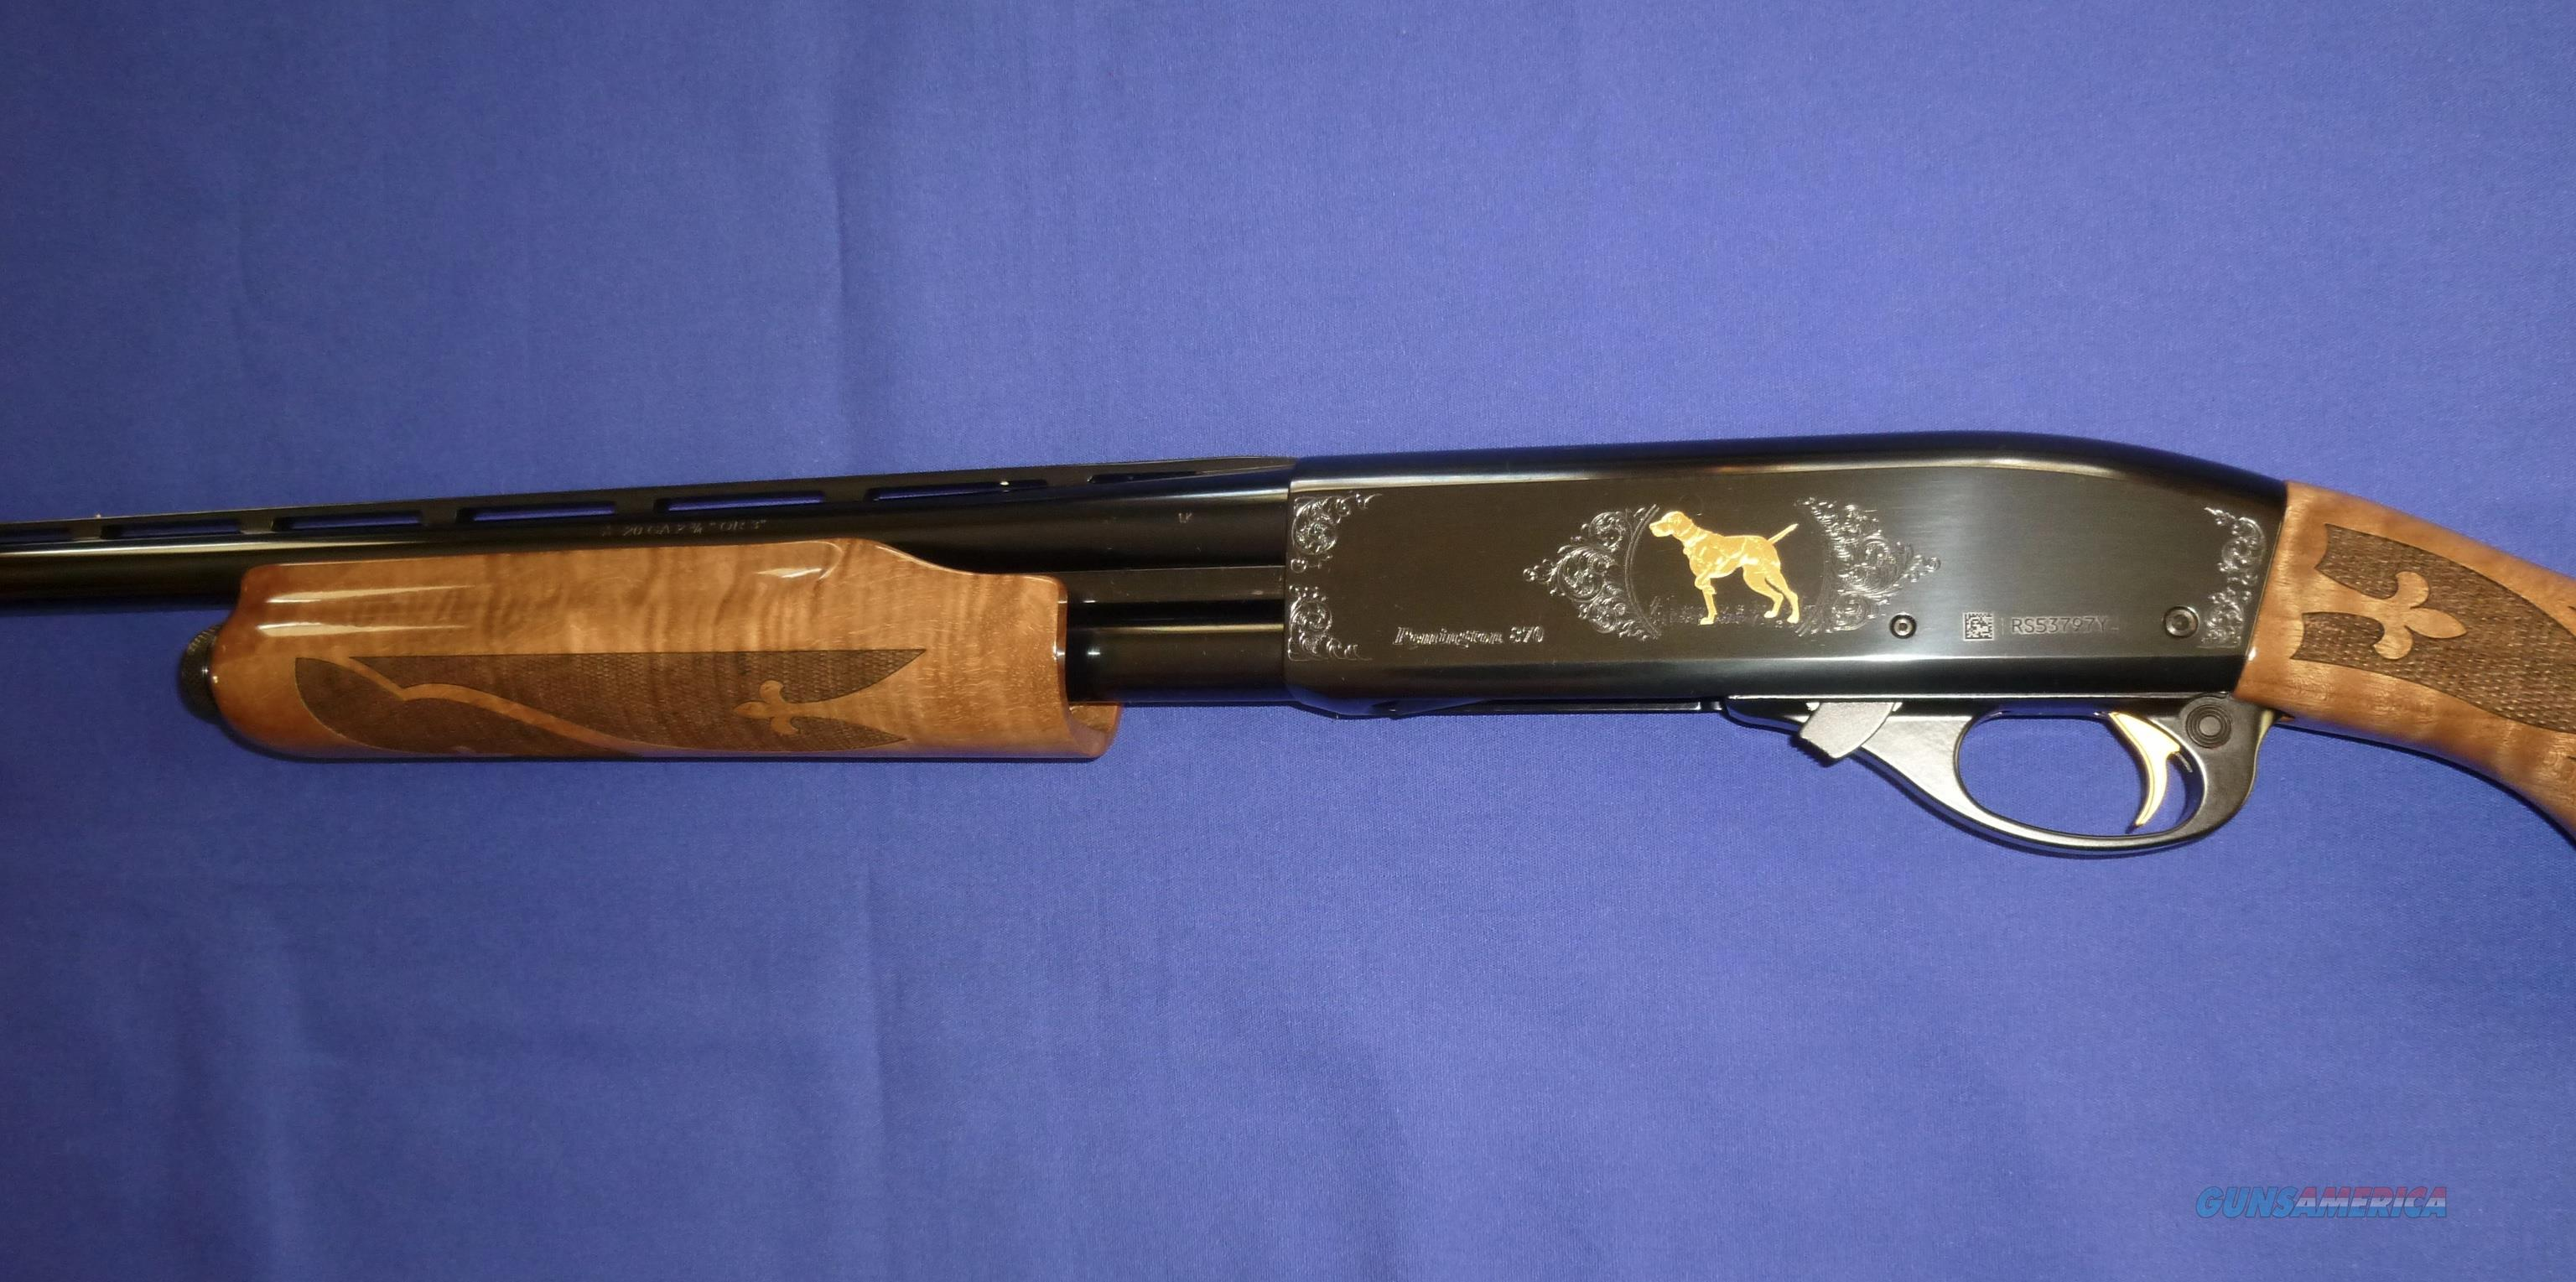 Remington 870 wingmaster american classic 20 gauge pump for Classic american